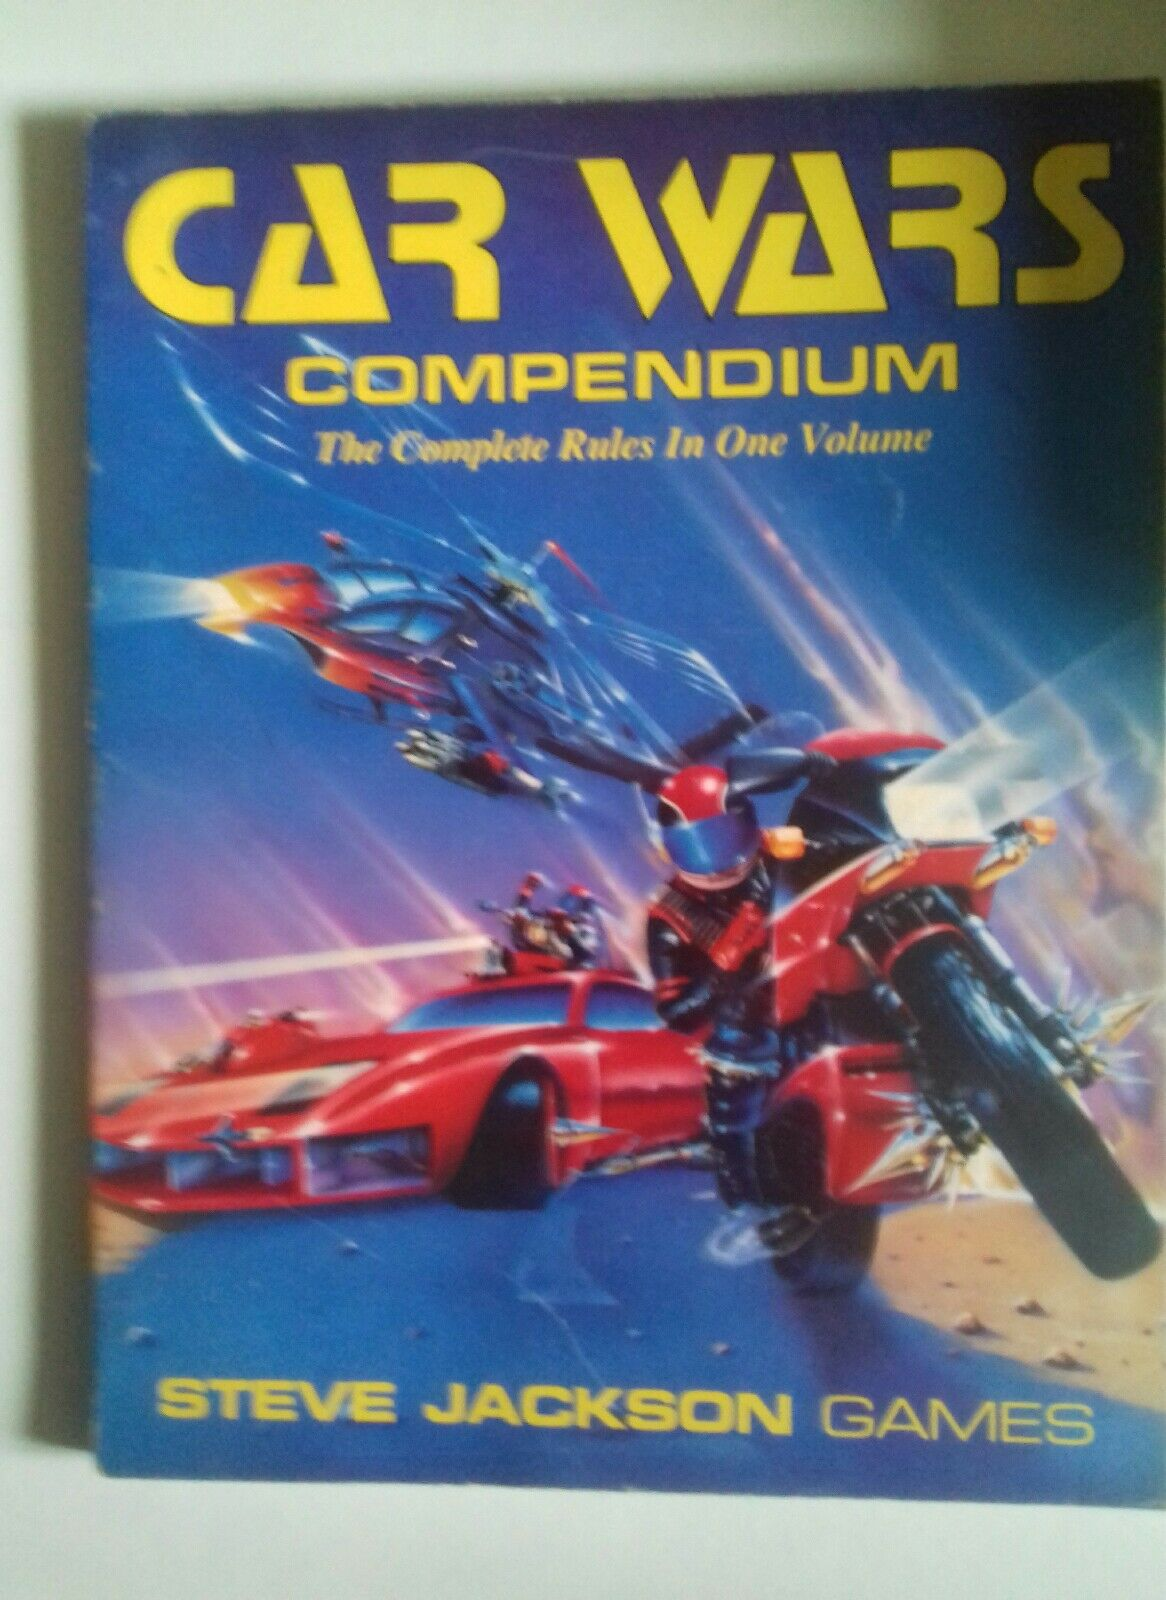 Car wars compendium RPG sci-fi roleplaying book